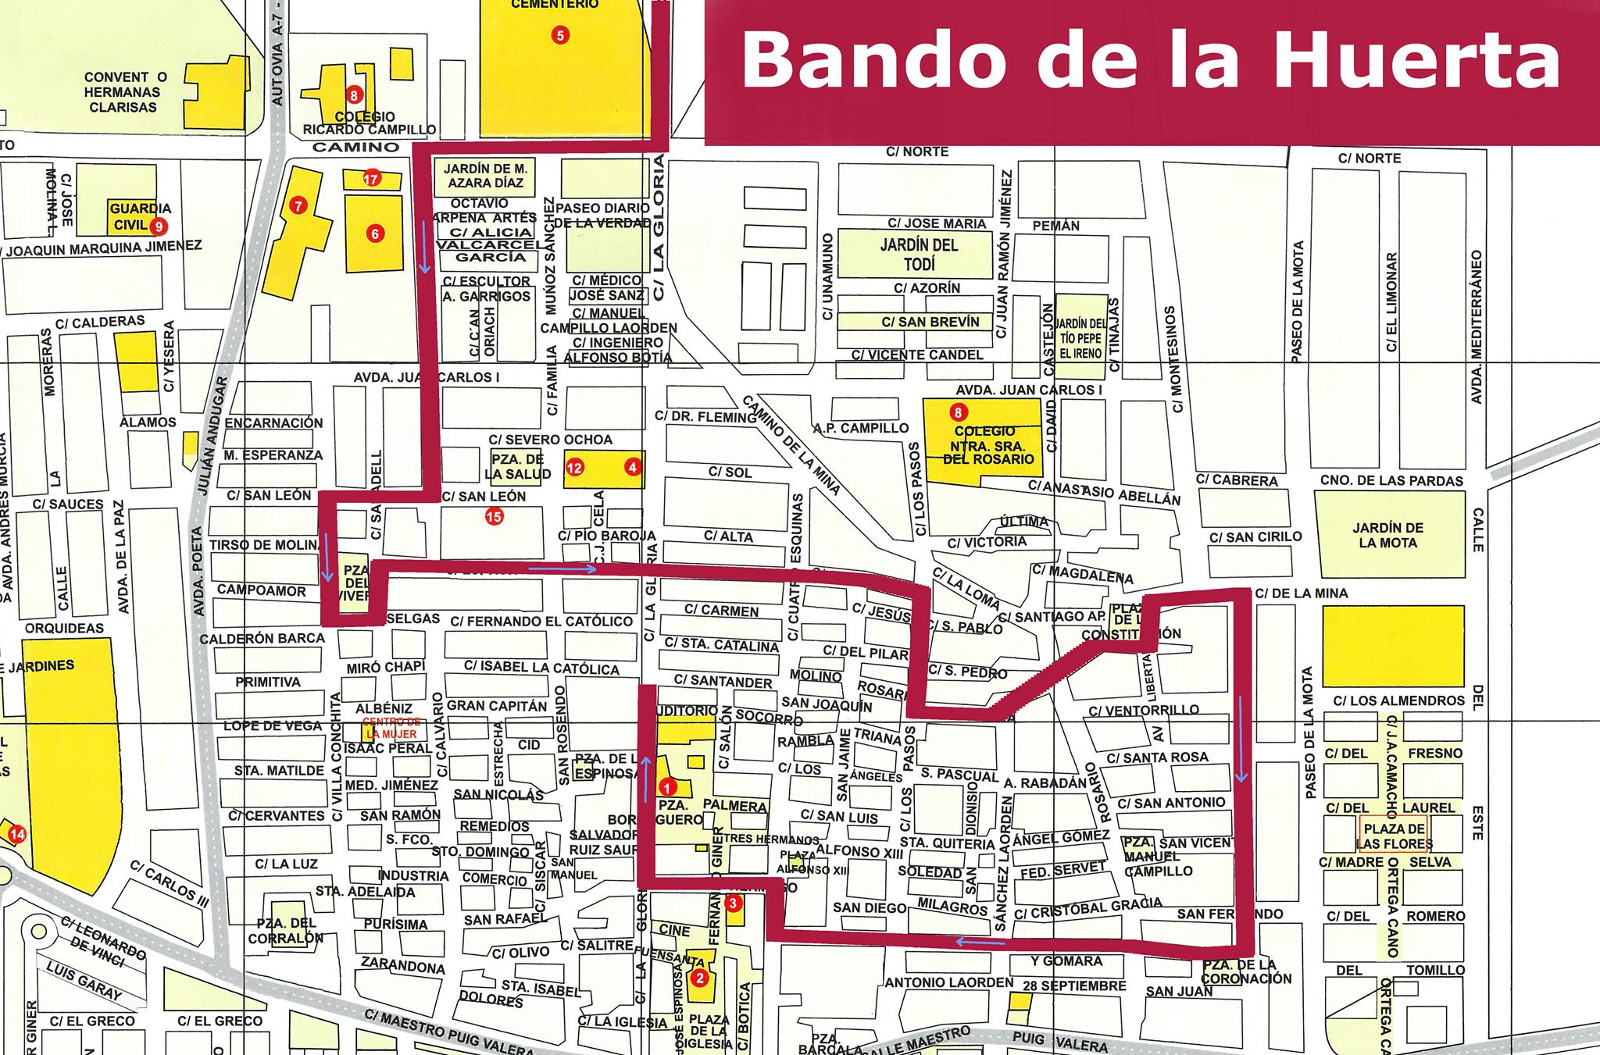 Cortes calles Bando Huerta 2018